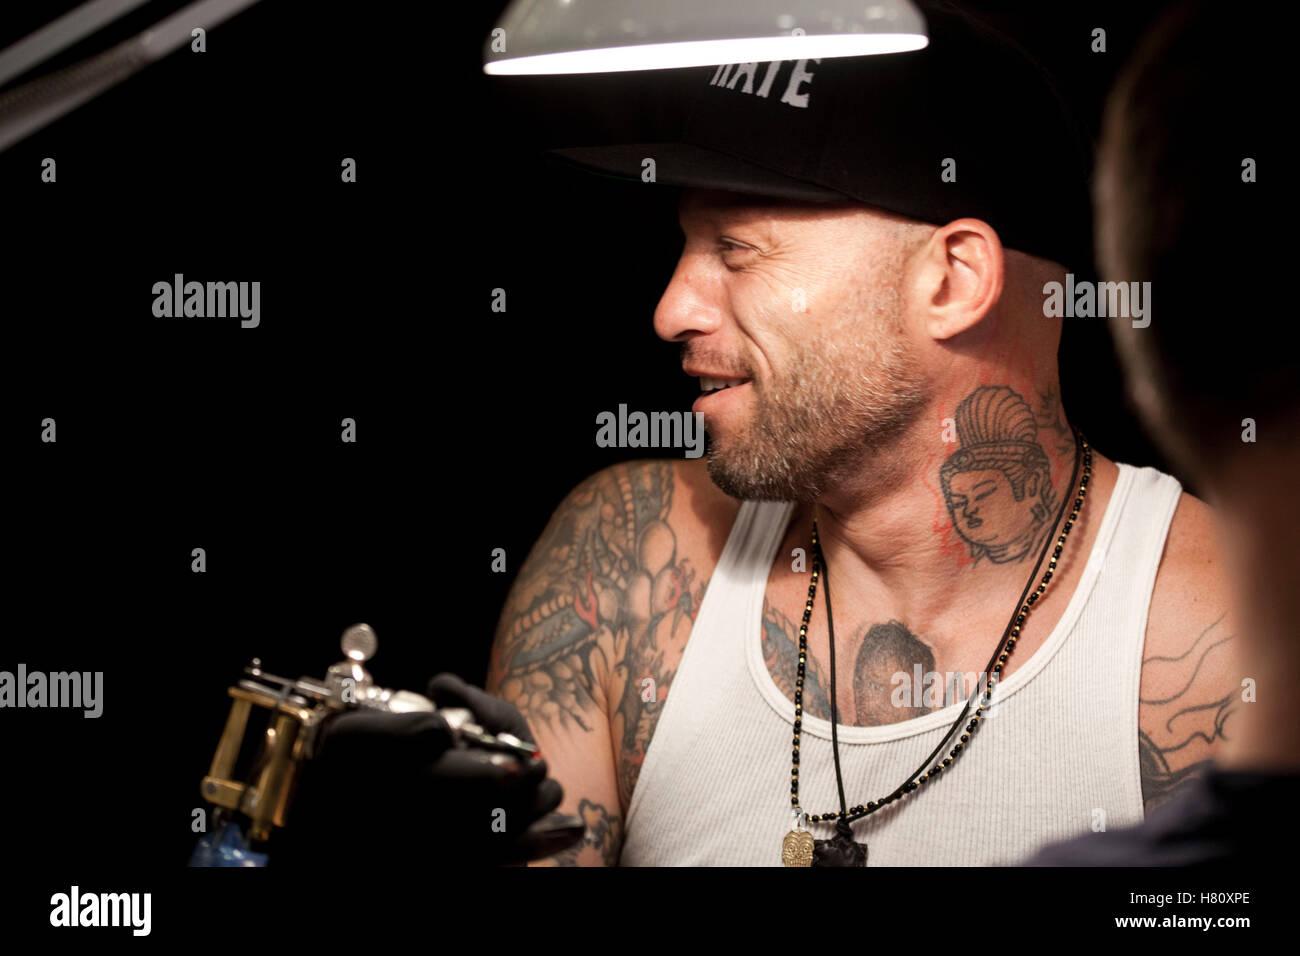 Tattoo artist Ami James attends the tattoo convention Copenhagen Ink 2013. - Stock Image